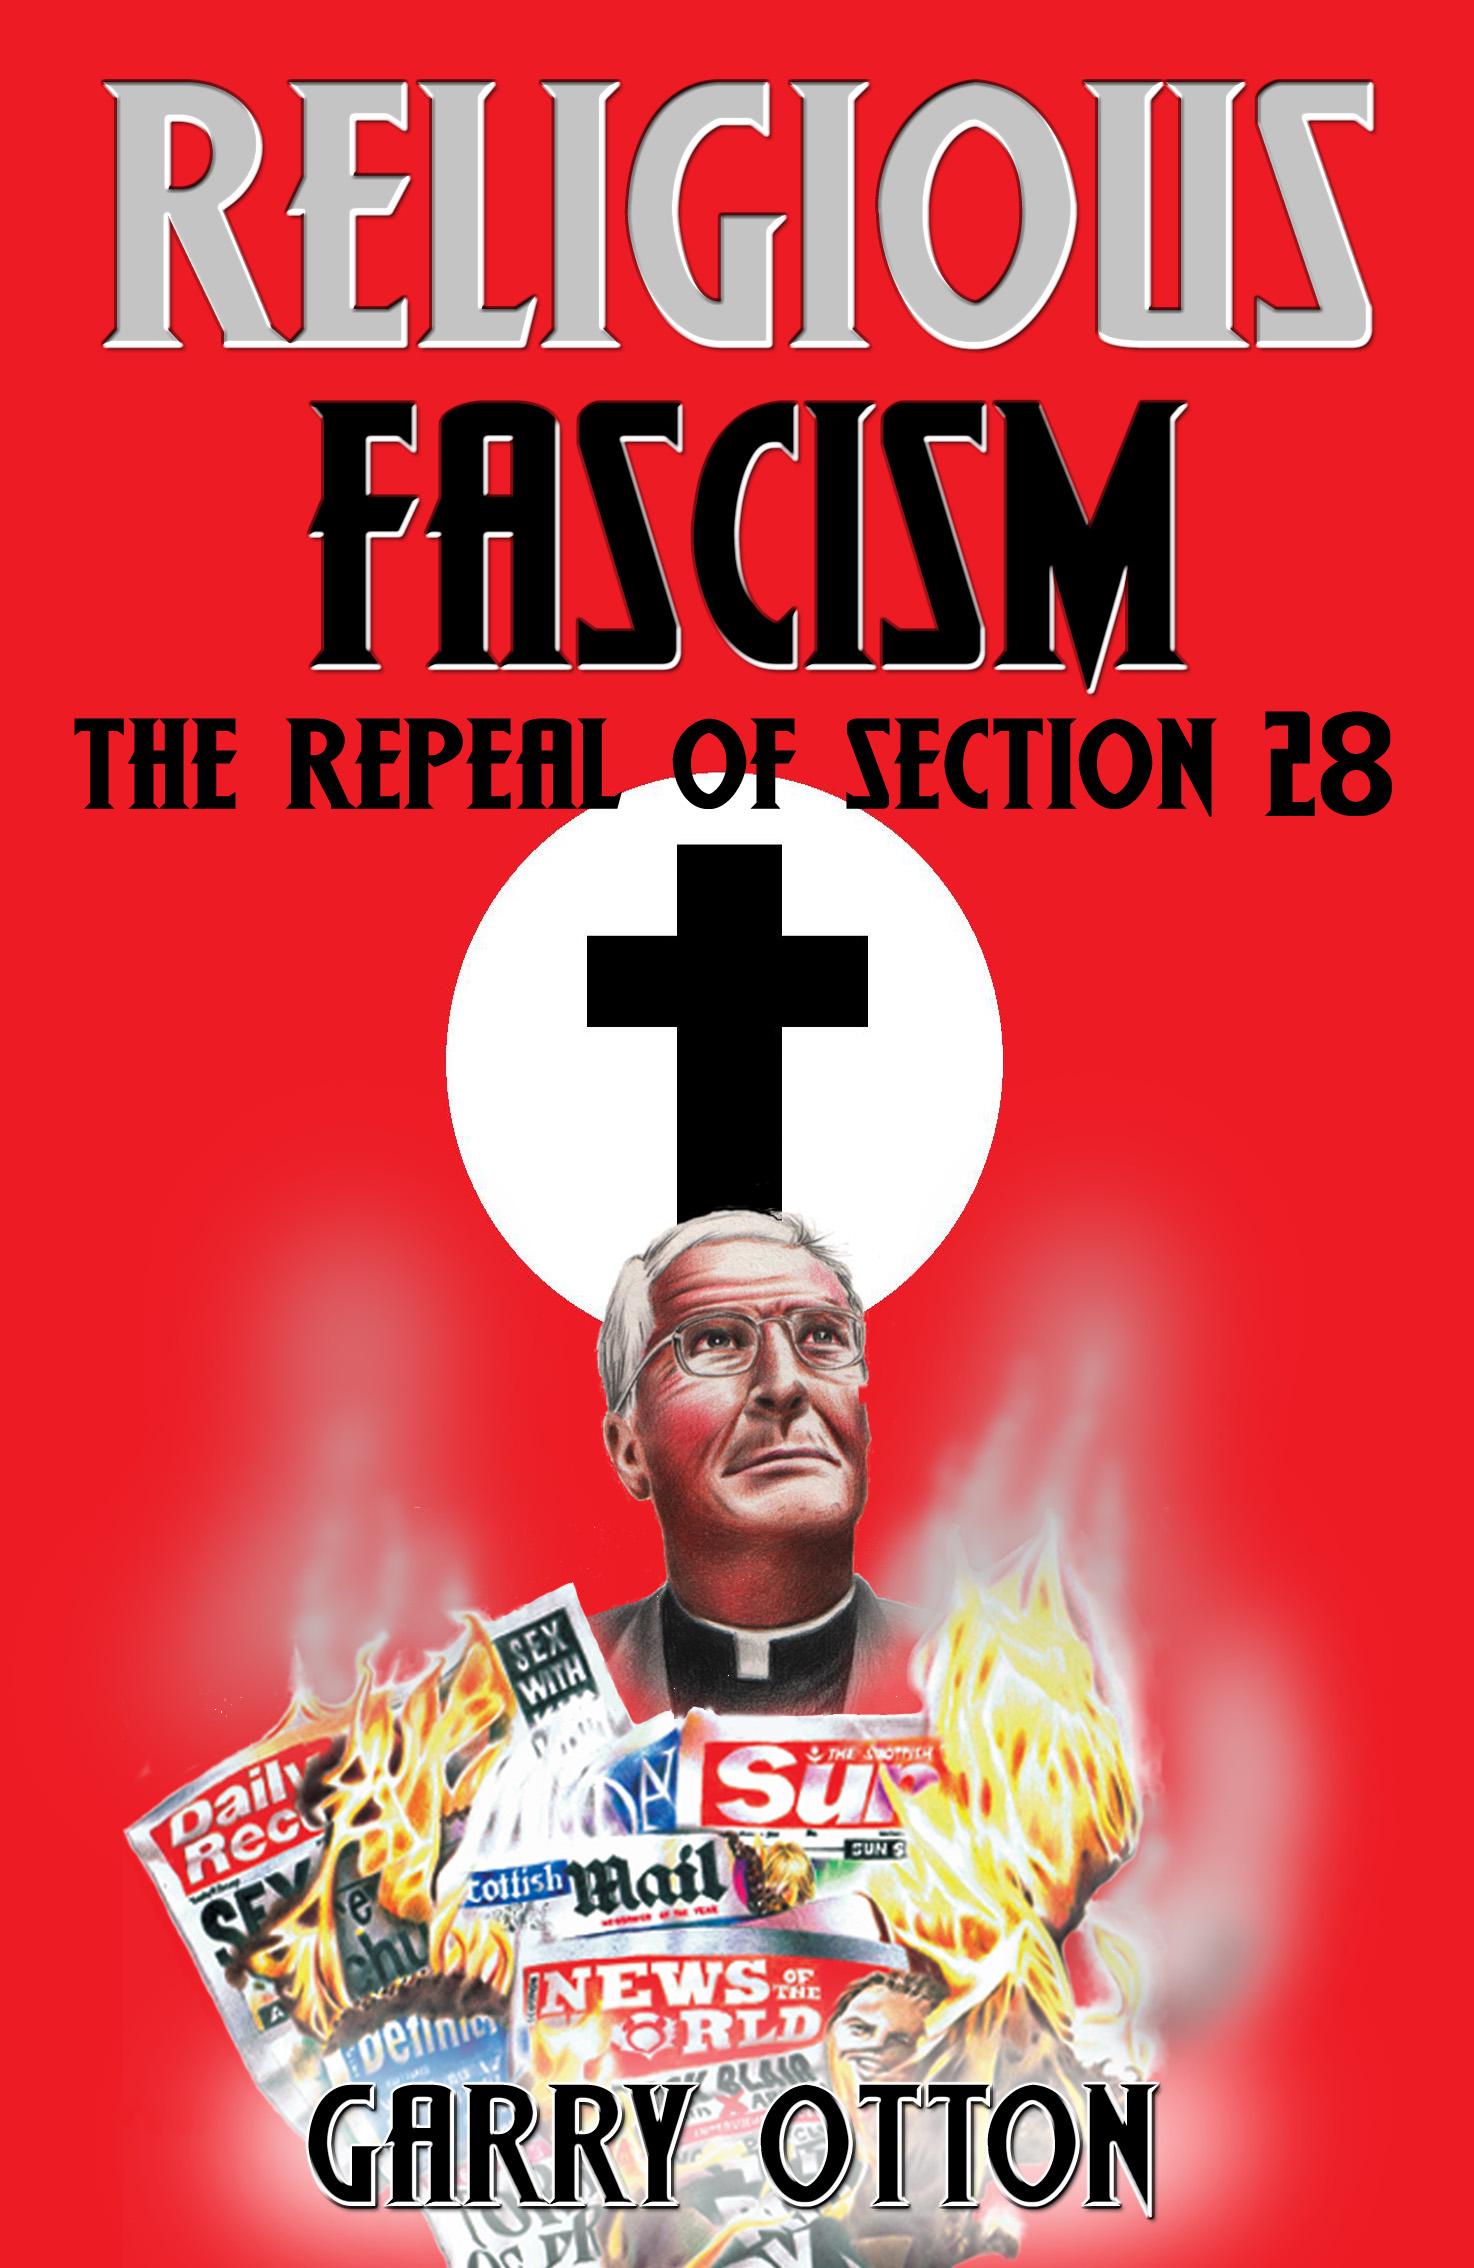 Fascist mysticism